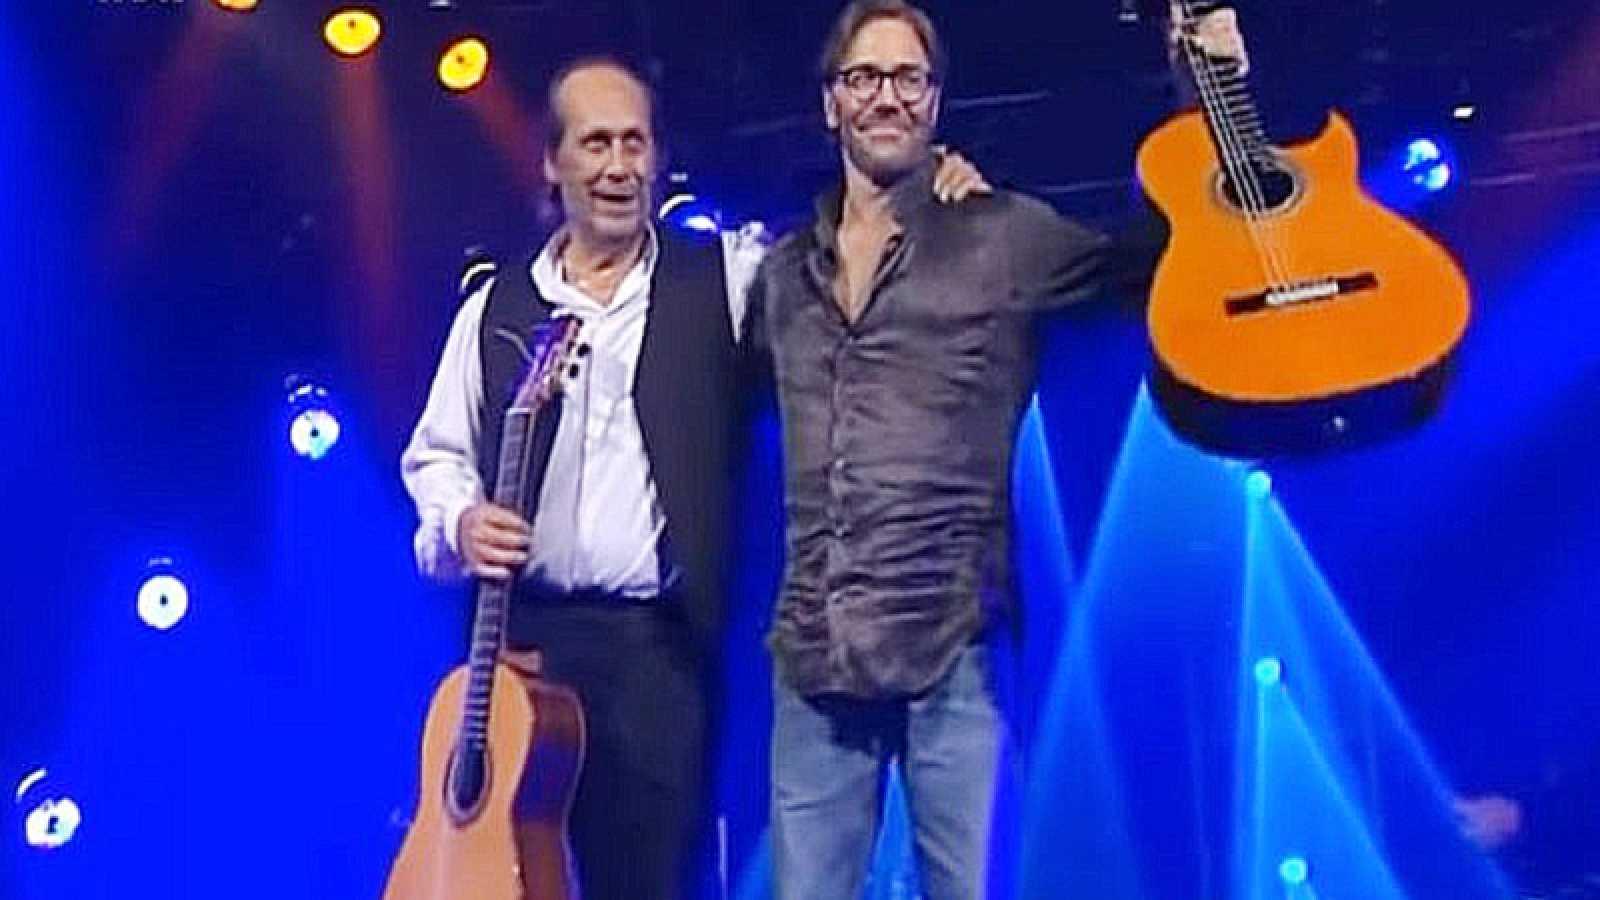 Próxima parada - Al Di Meola, Eric Clapton y Diana Krall - 15/04/21 - escuchar ahora